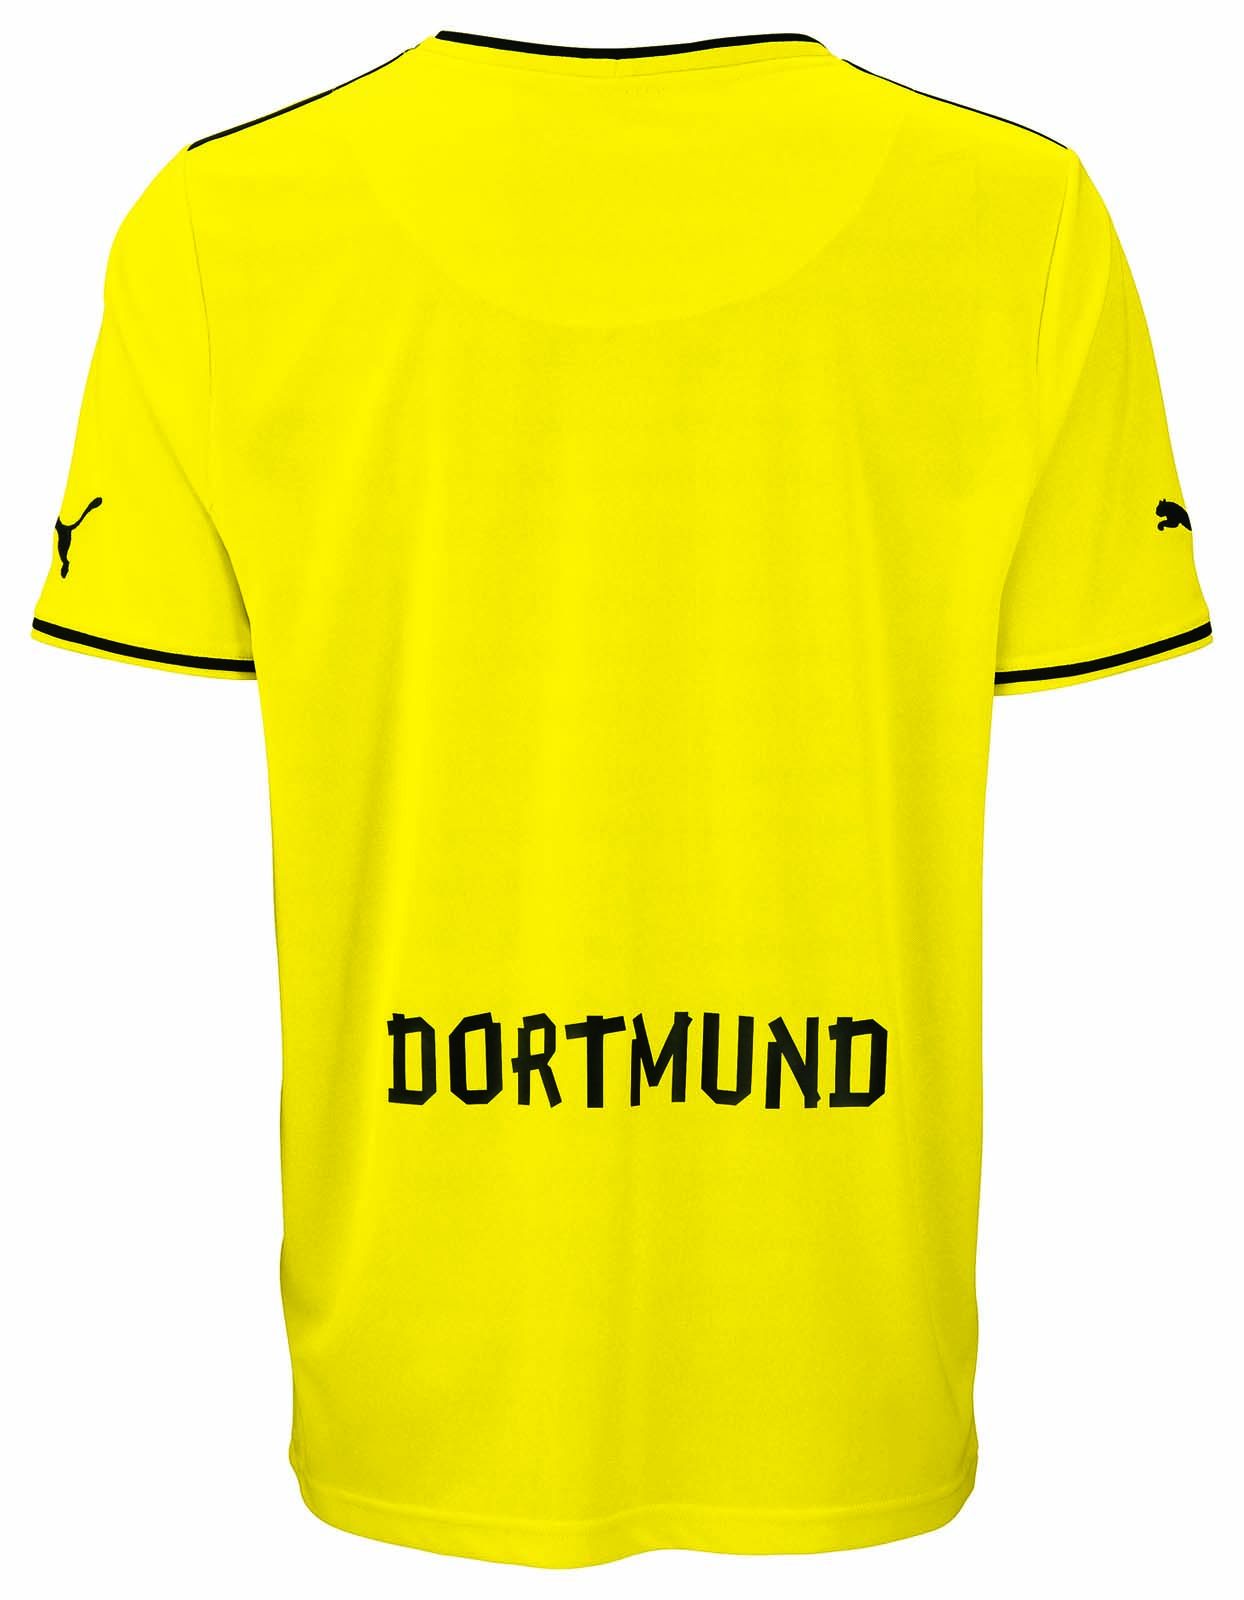 Borussia Dortmund 2013-14 Wintertrikot (3)